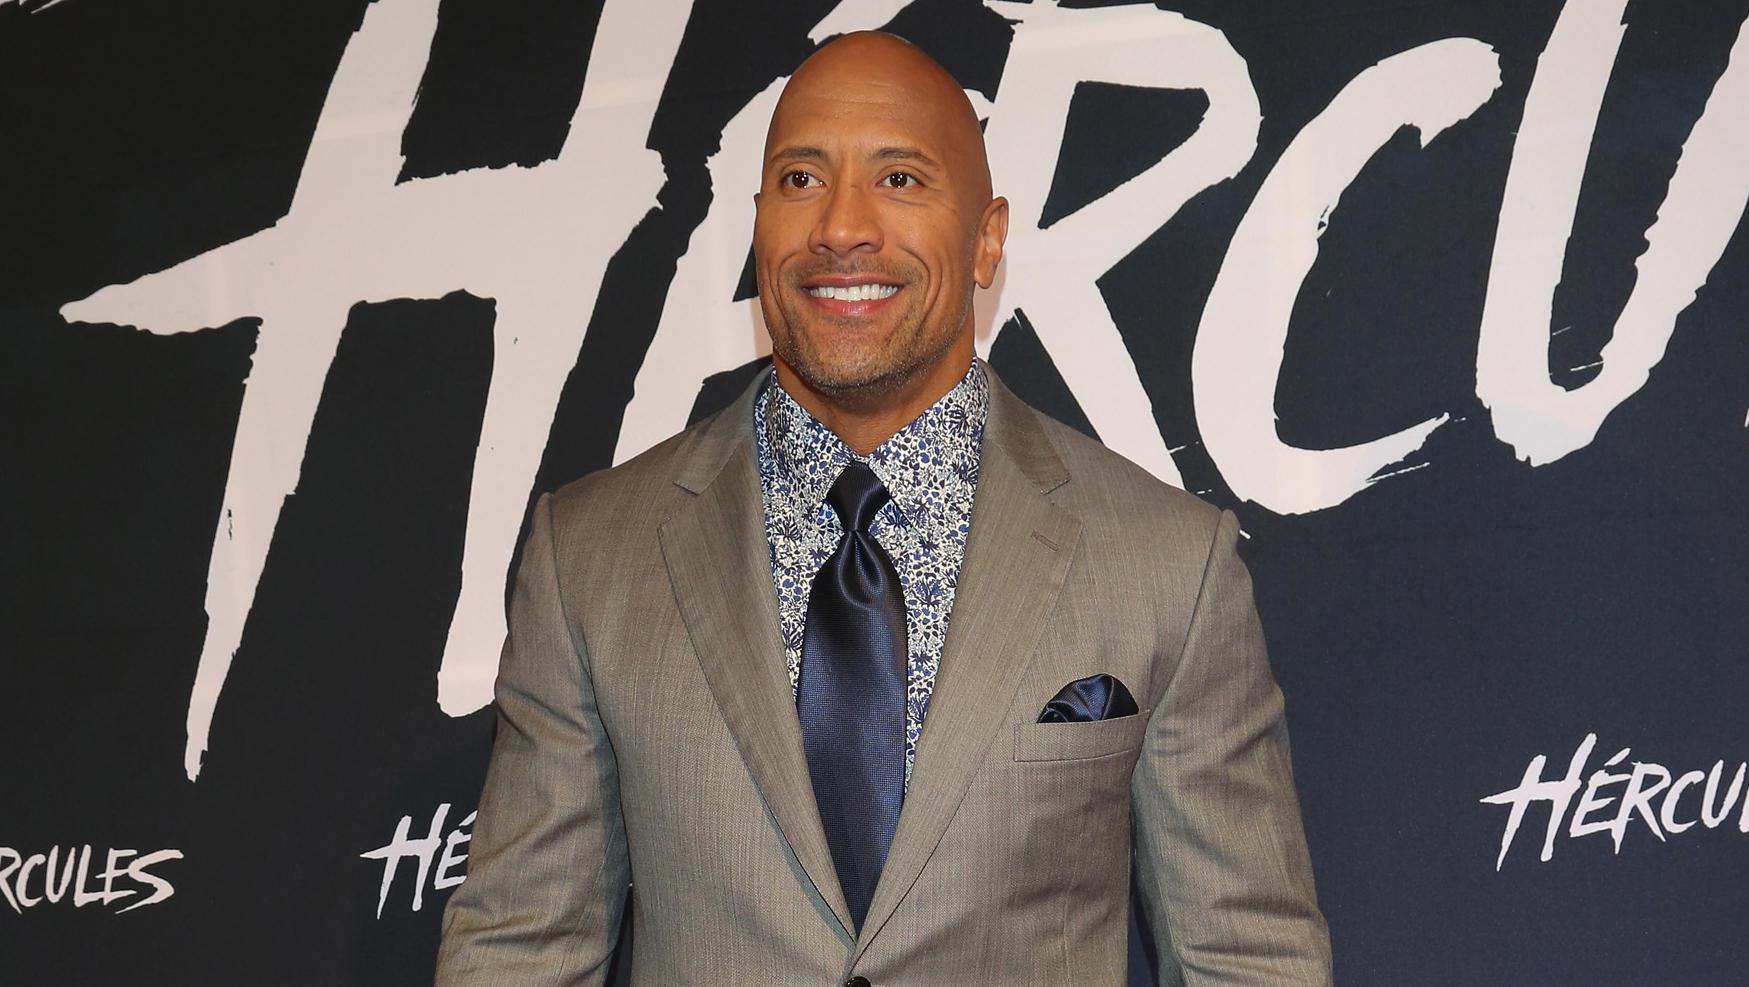 Dwayne Johnson to star in DC Comics film